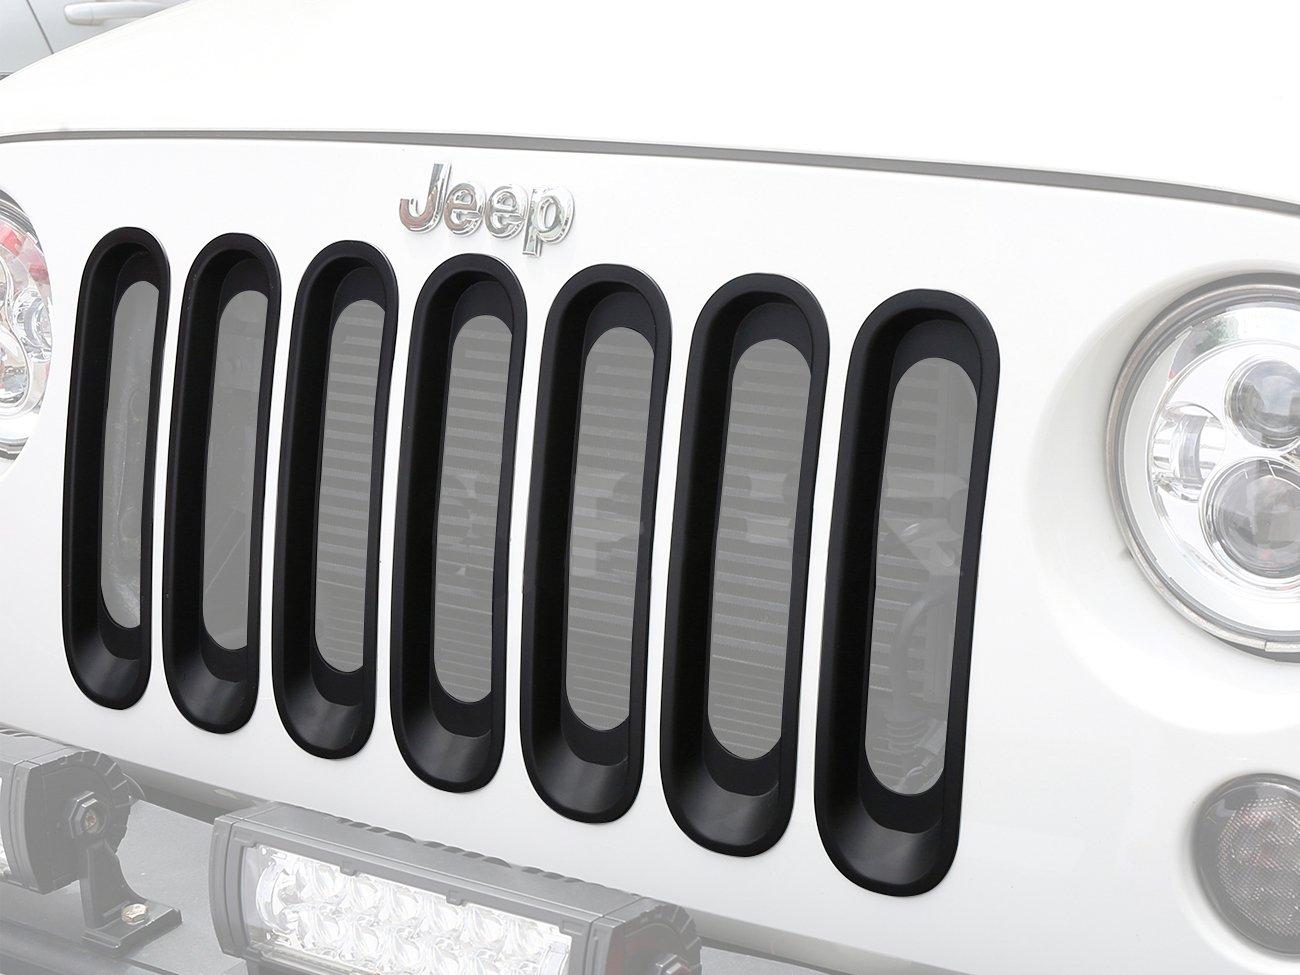 Atoplite Black Bow Tie Emblem delete logo Insert Grille Fits Chevrolet Camaro 2010-2013